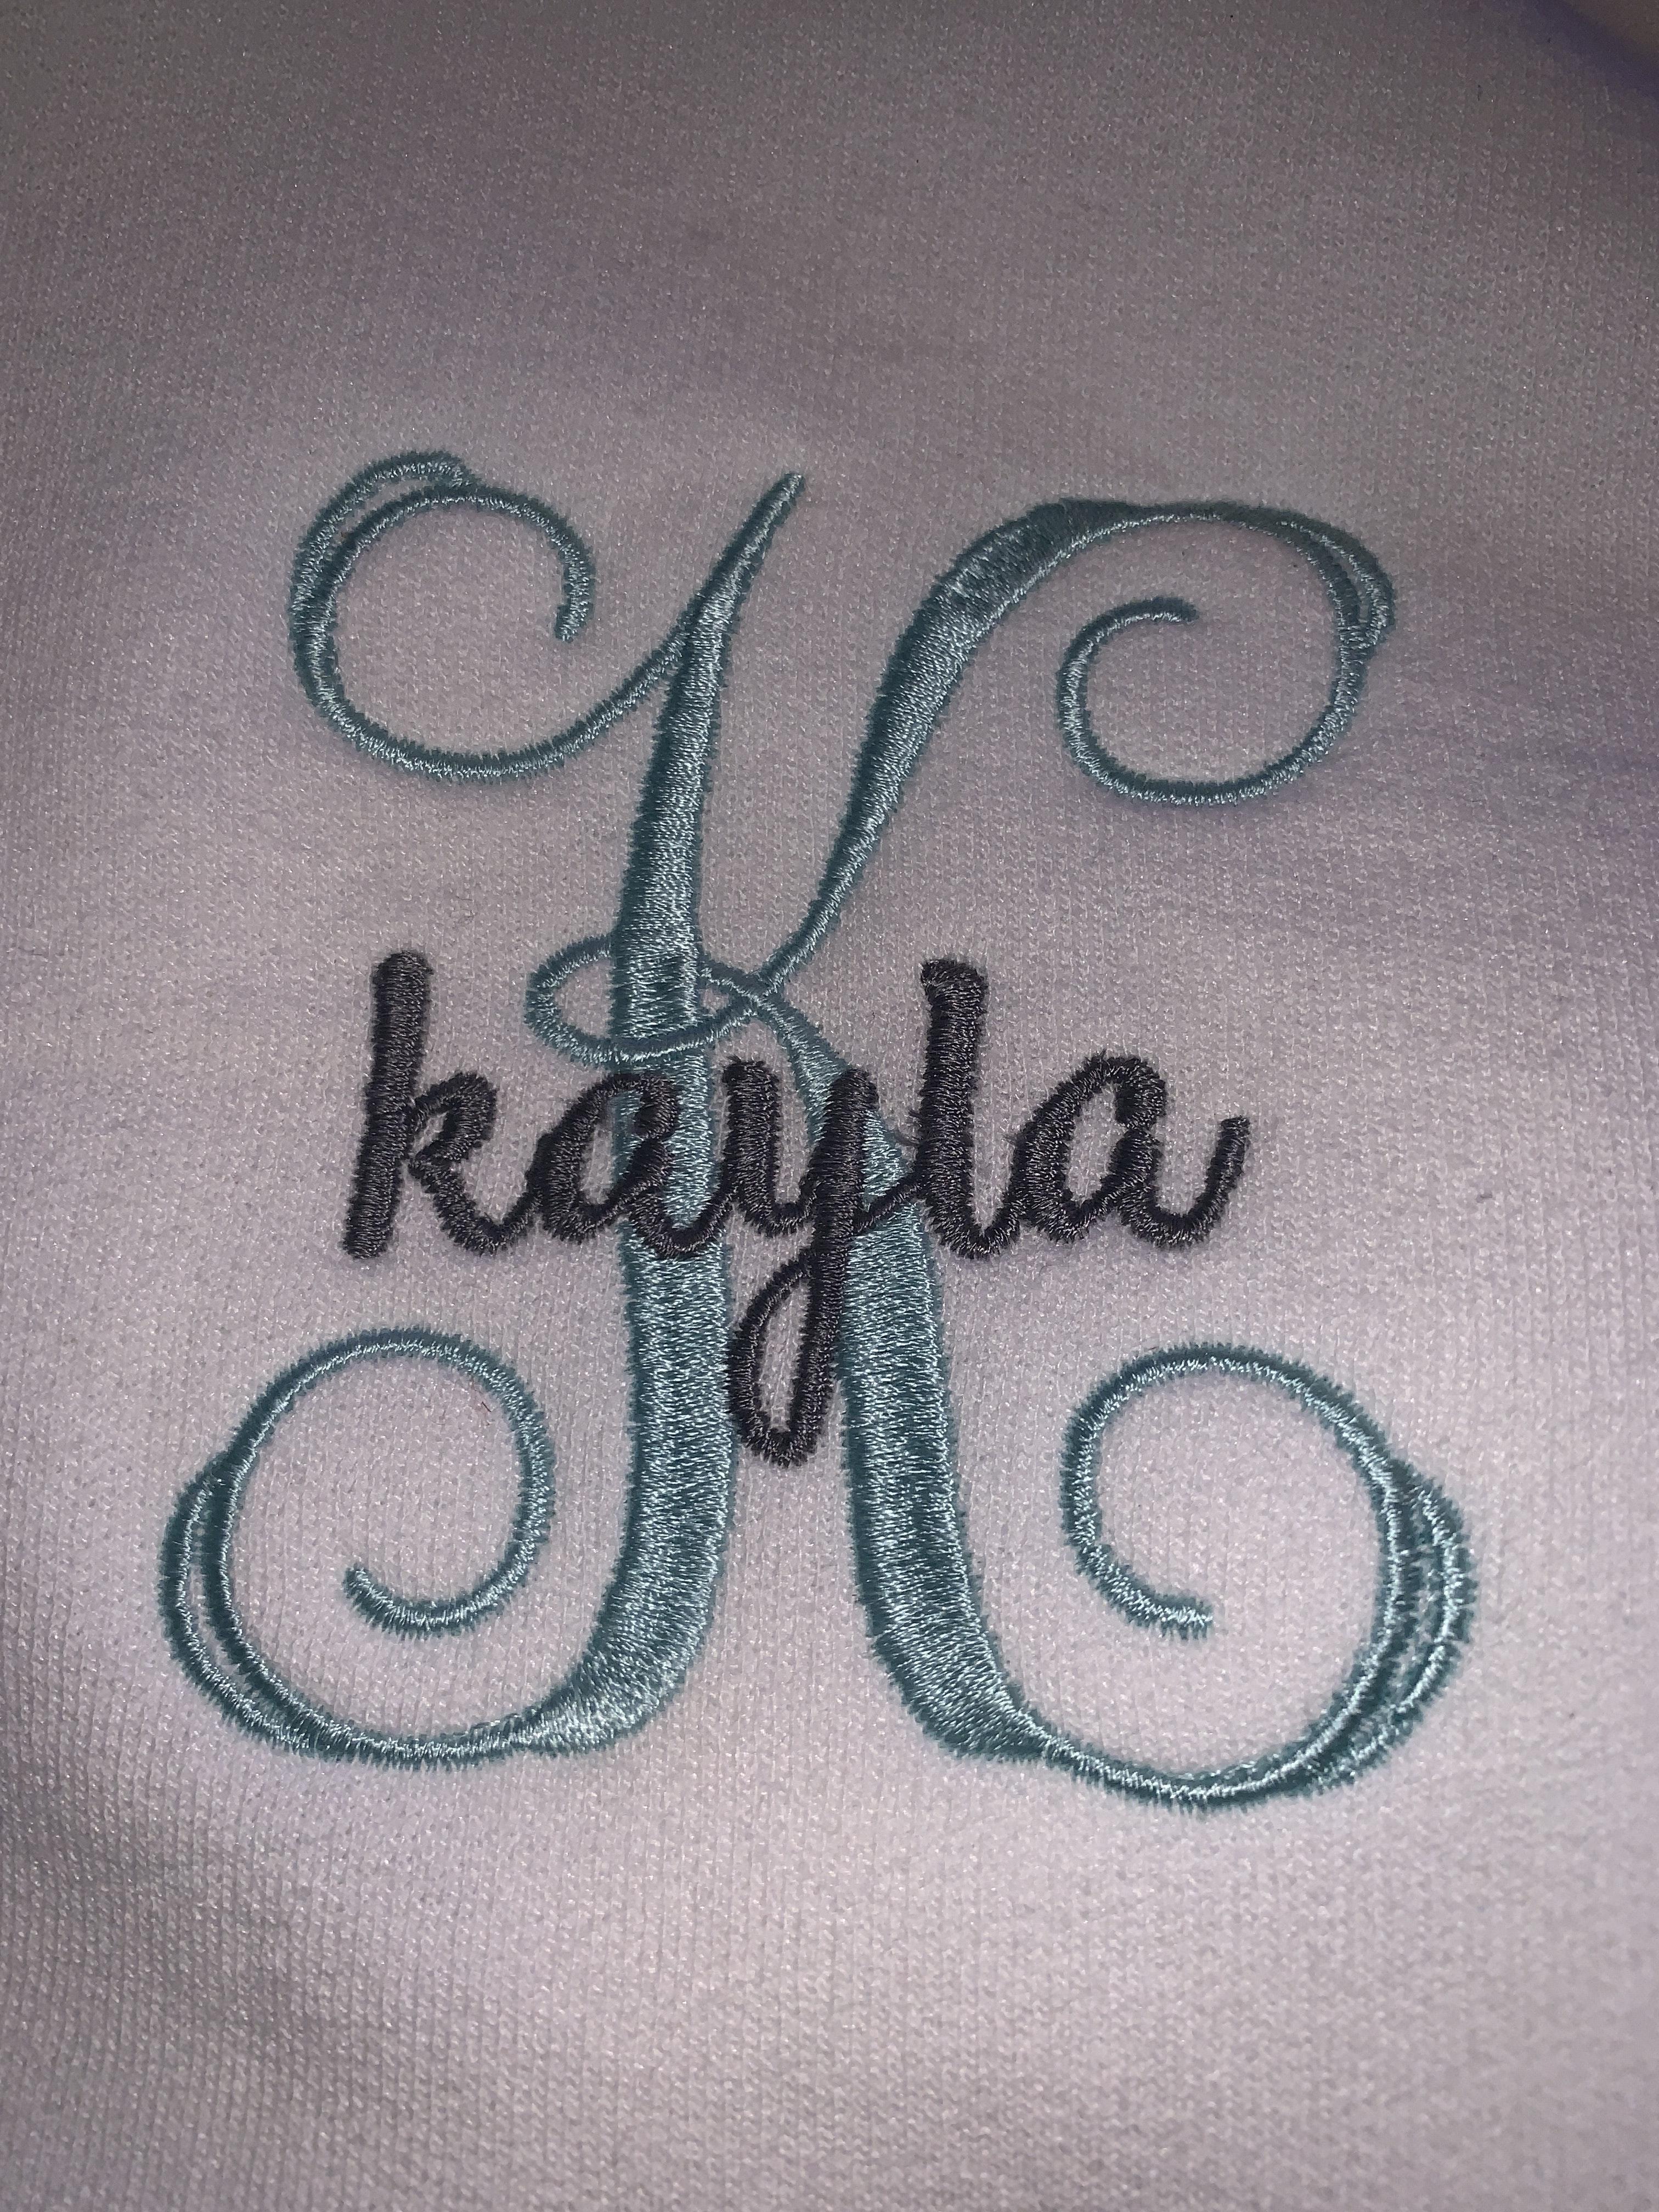 Jerzees 995M customer review by Kayla Jones Very soft